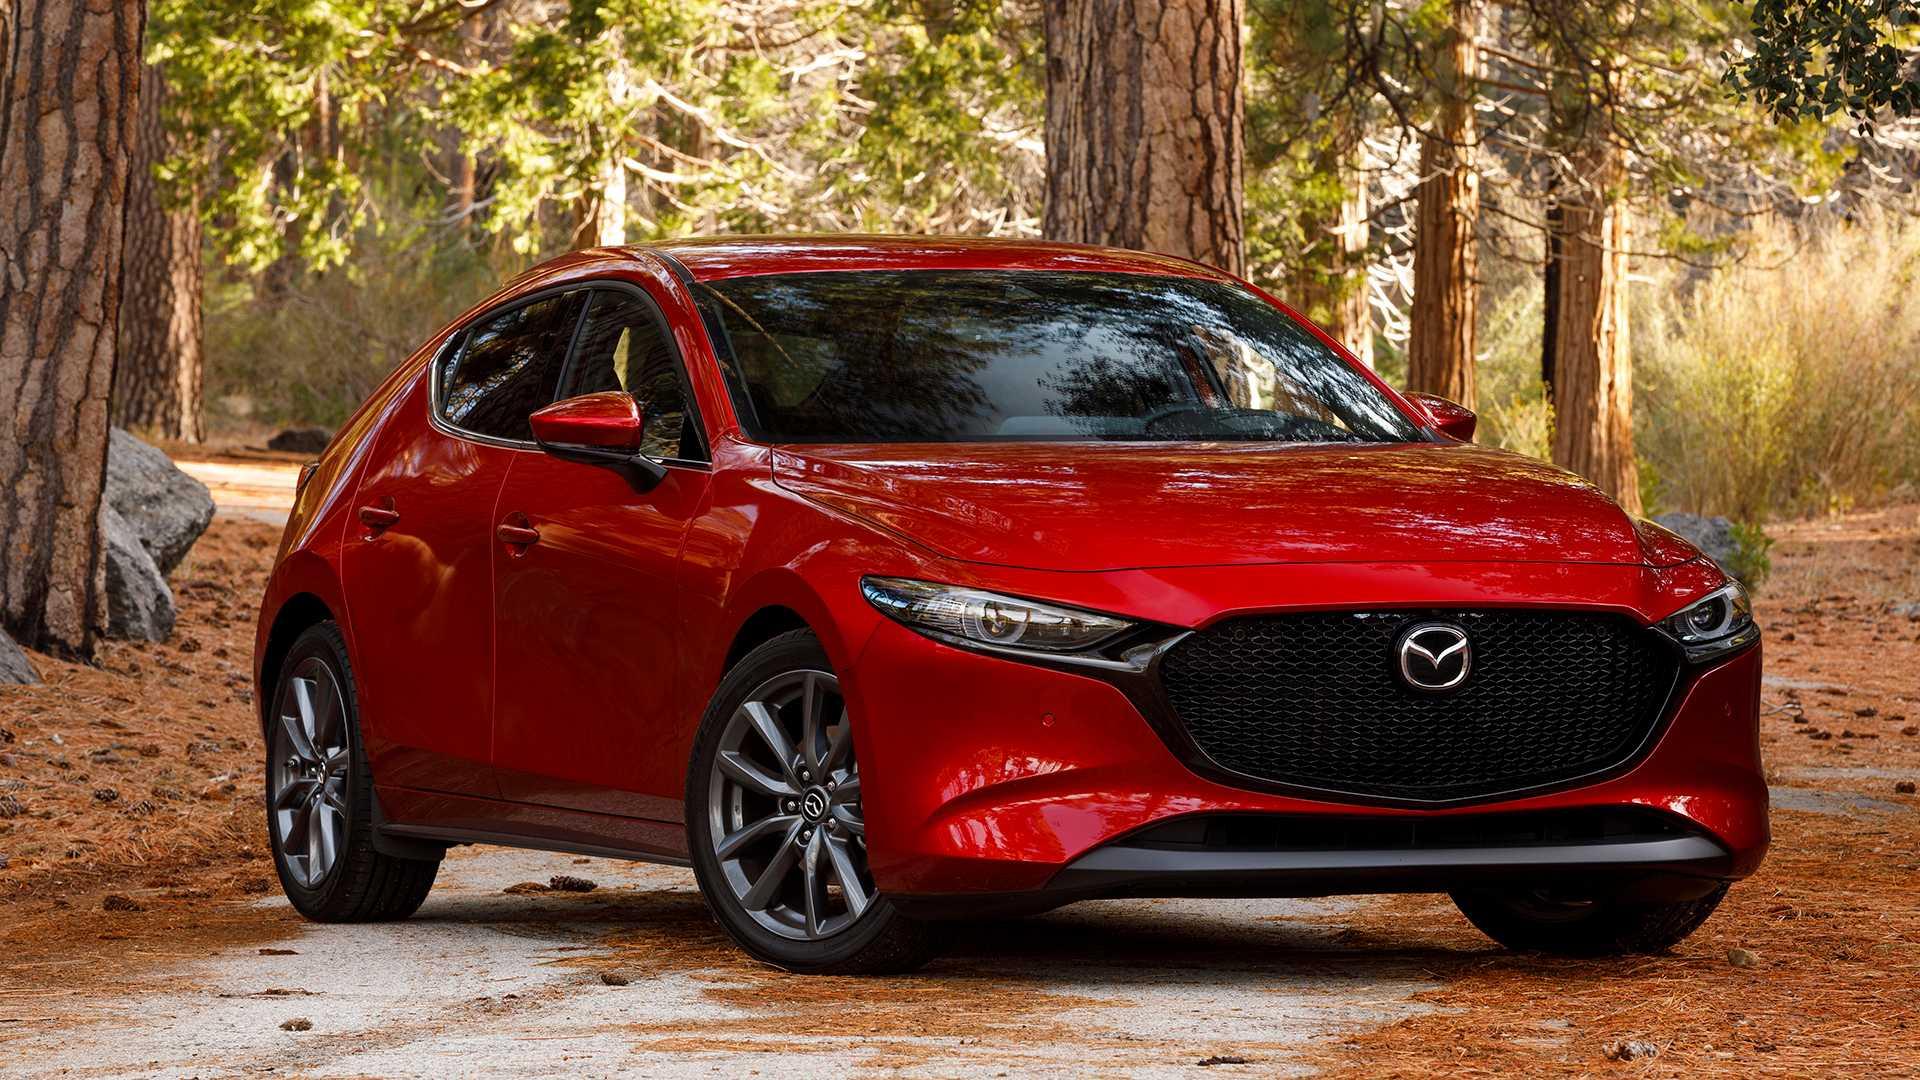 Llamado a revisión por parte de Mazda de México a su modelo Mazda3 año 2019